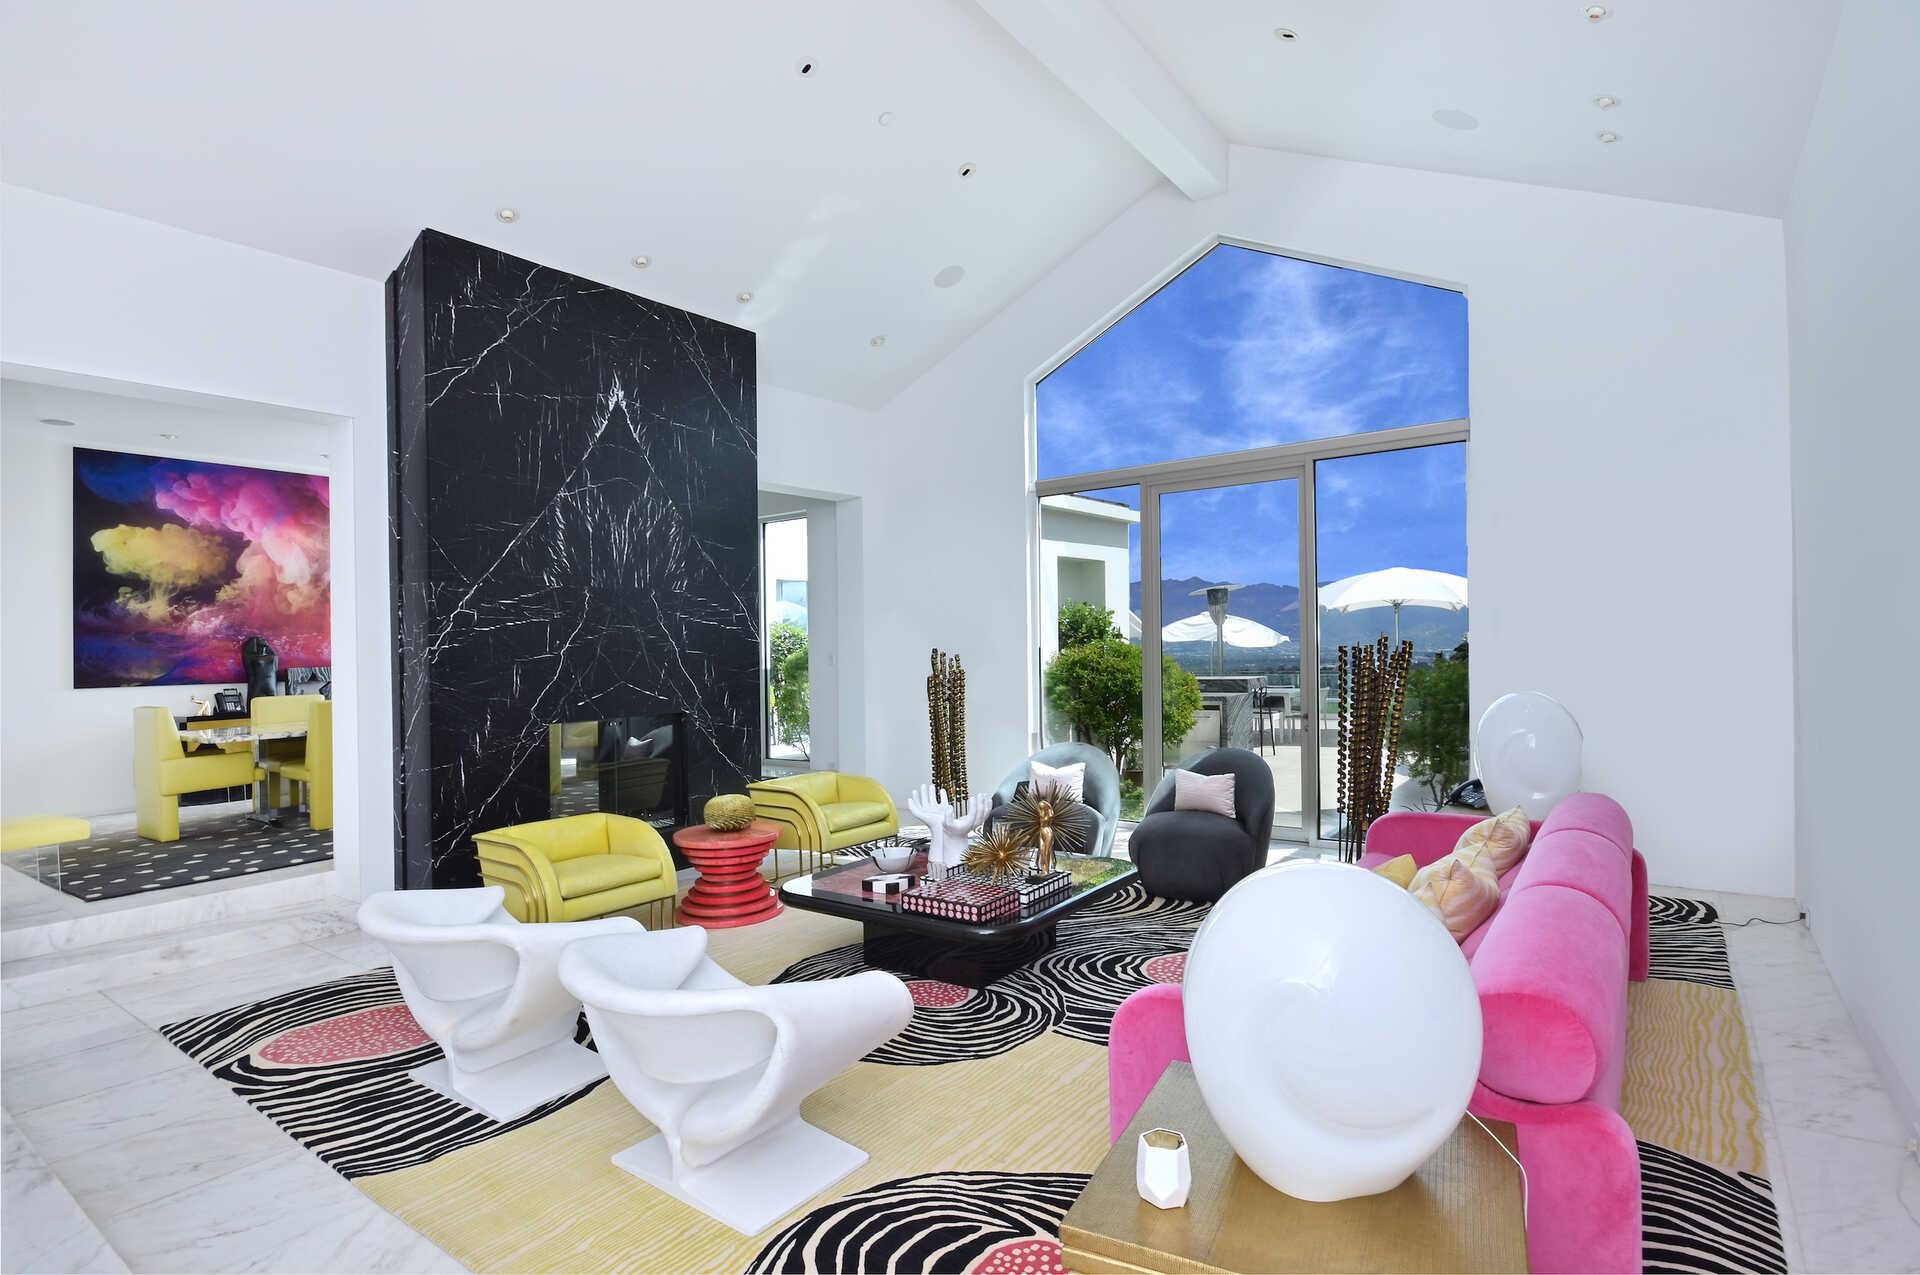 Gwen Stefani sold her Beverly Hills mansion for $21.65 million — take a look inside